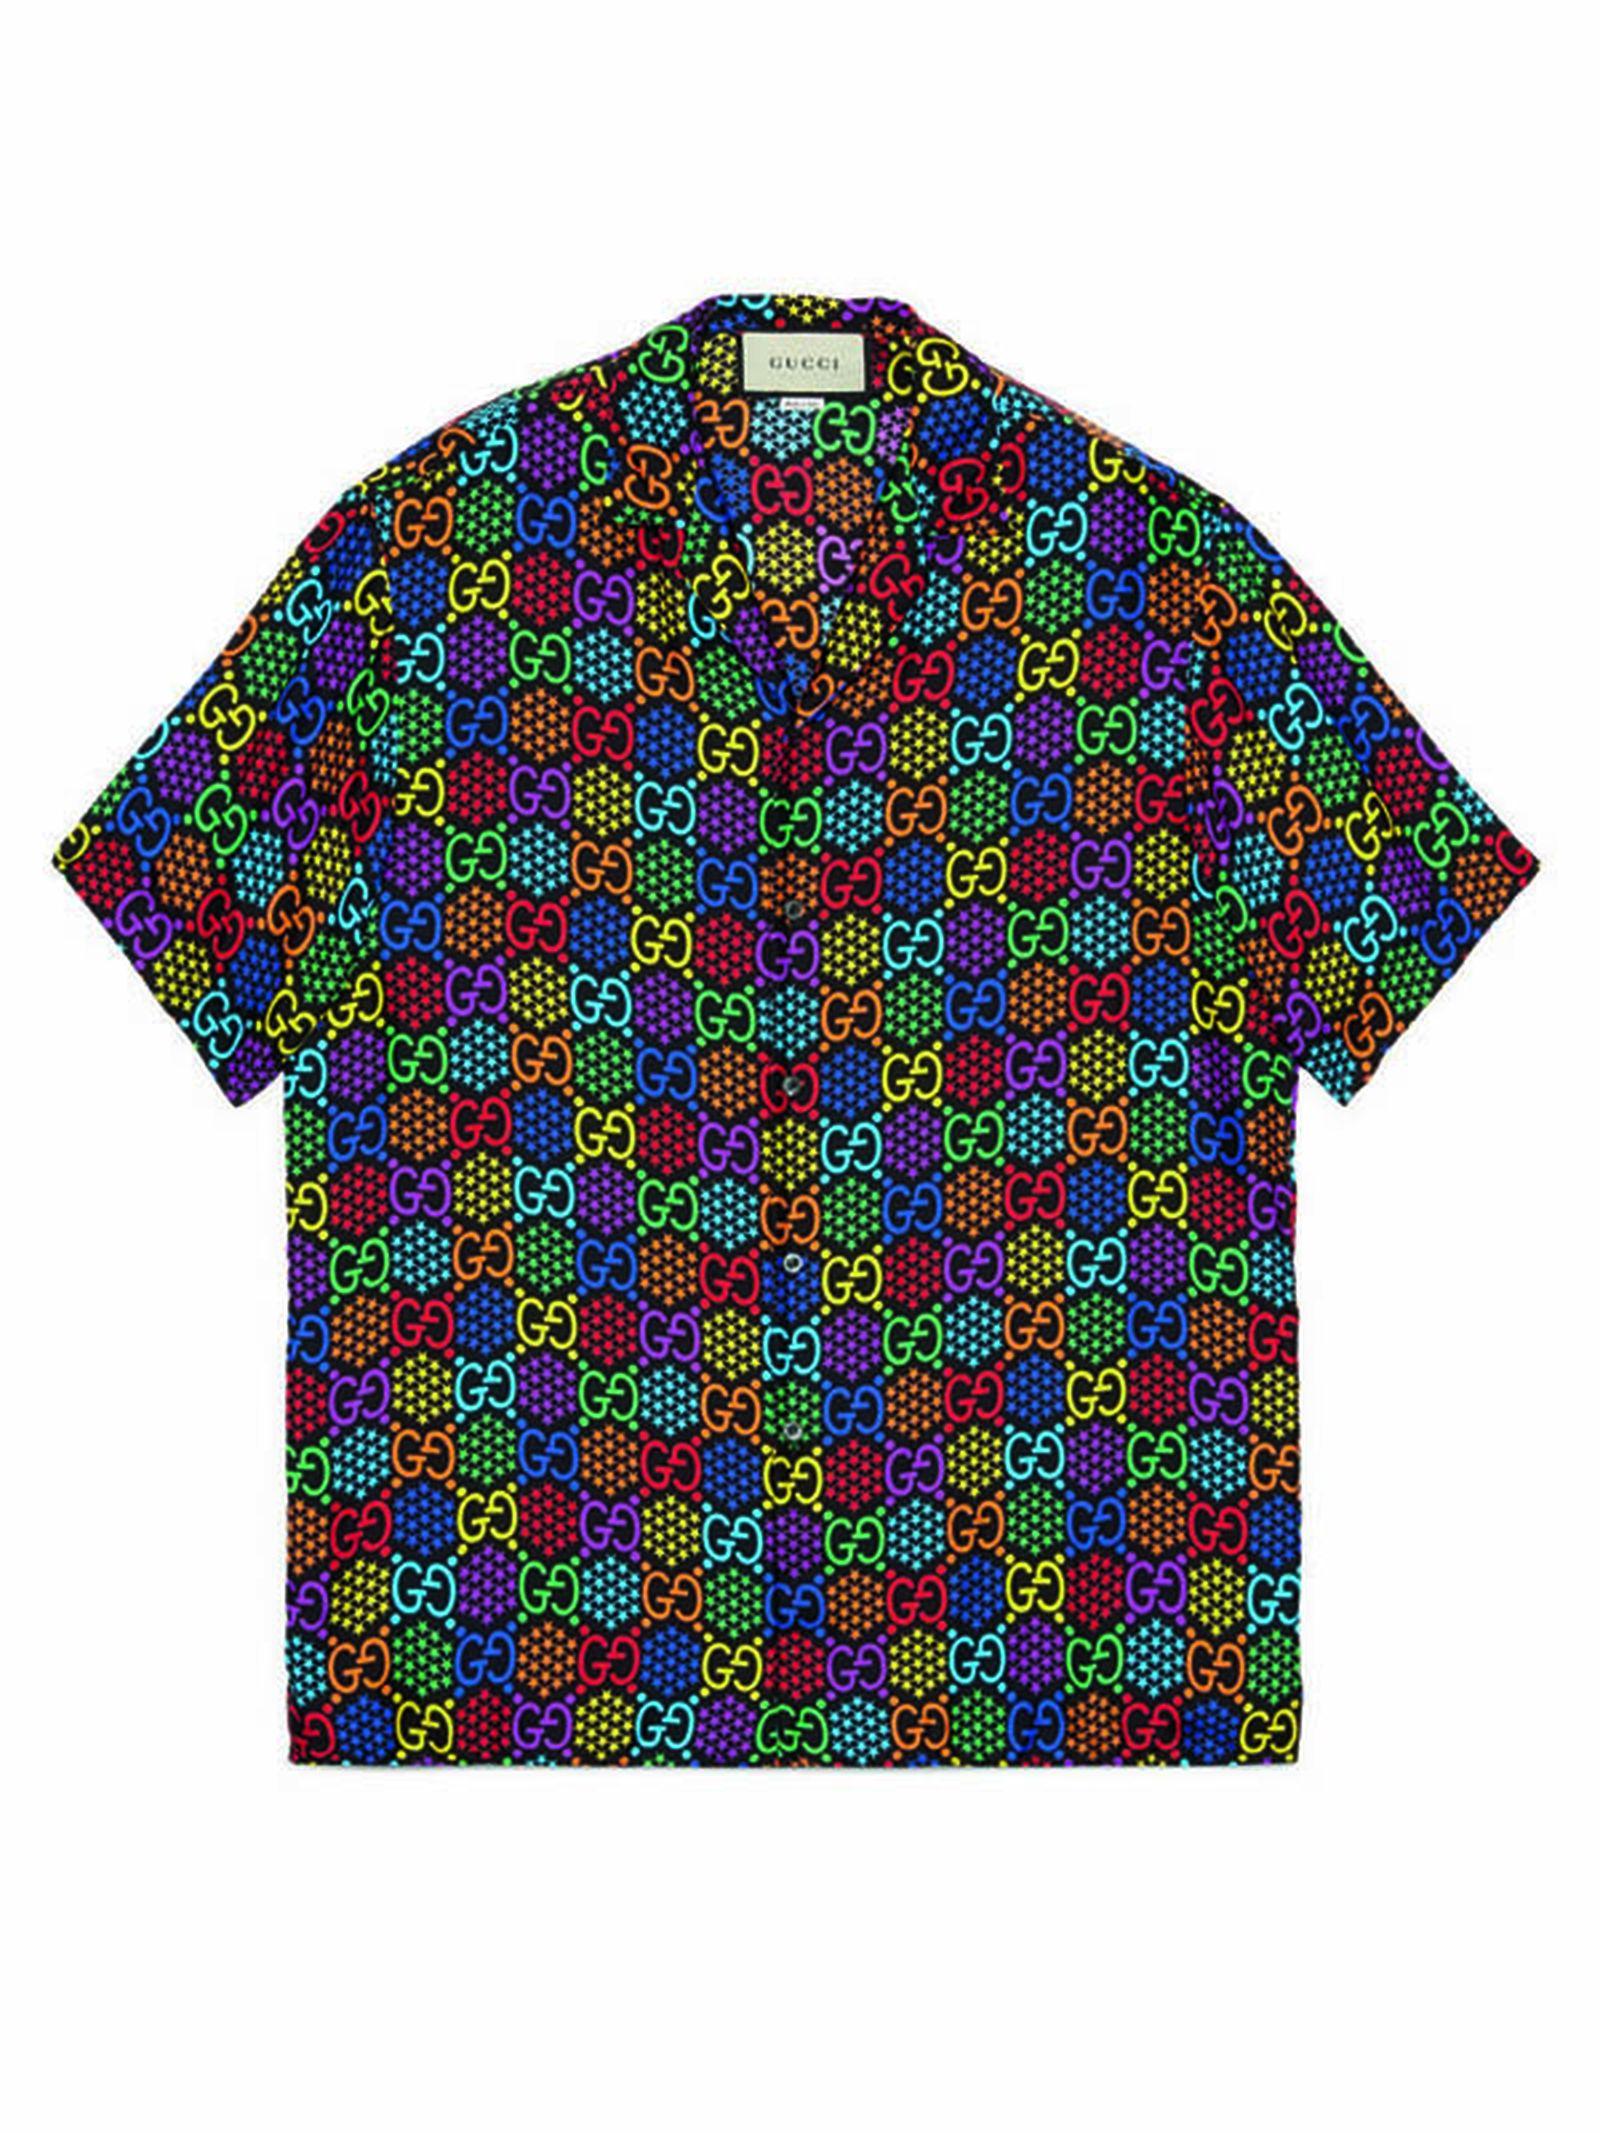 18gucci-psychedelics-pop-up